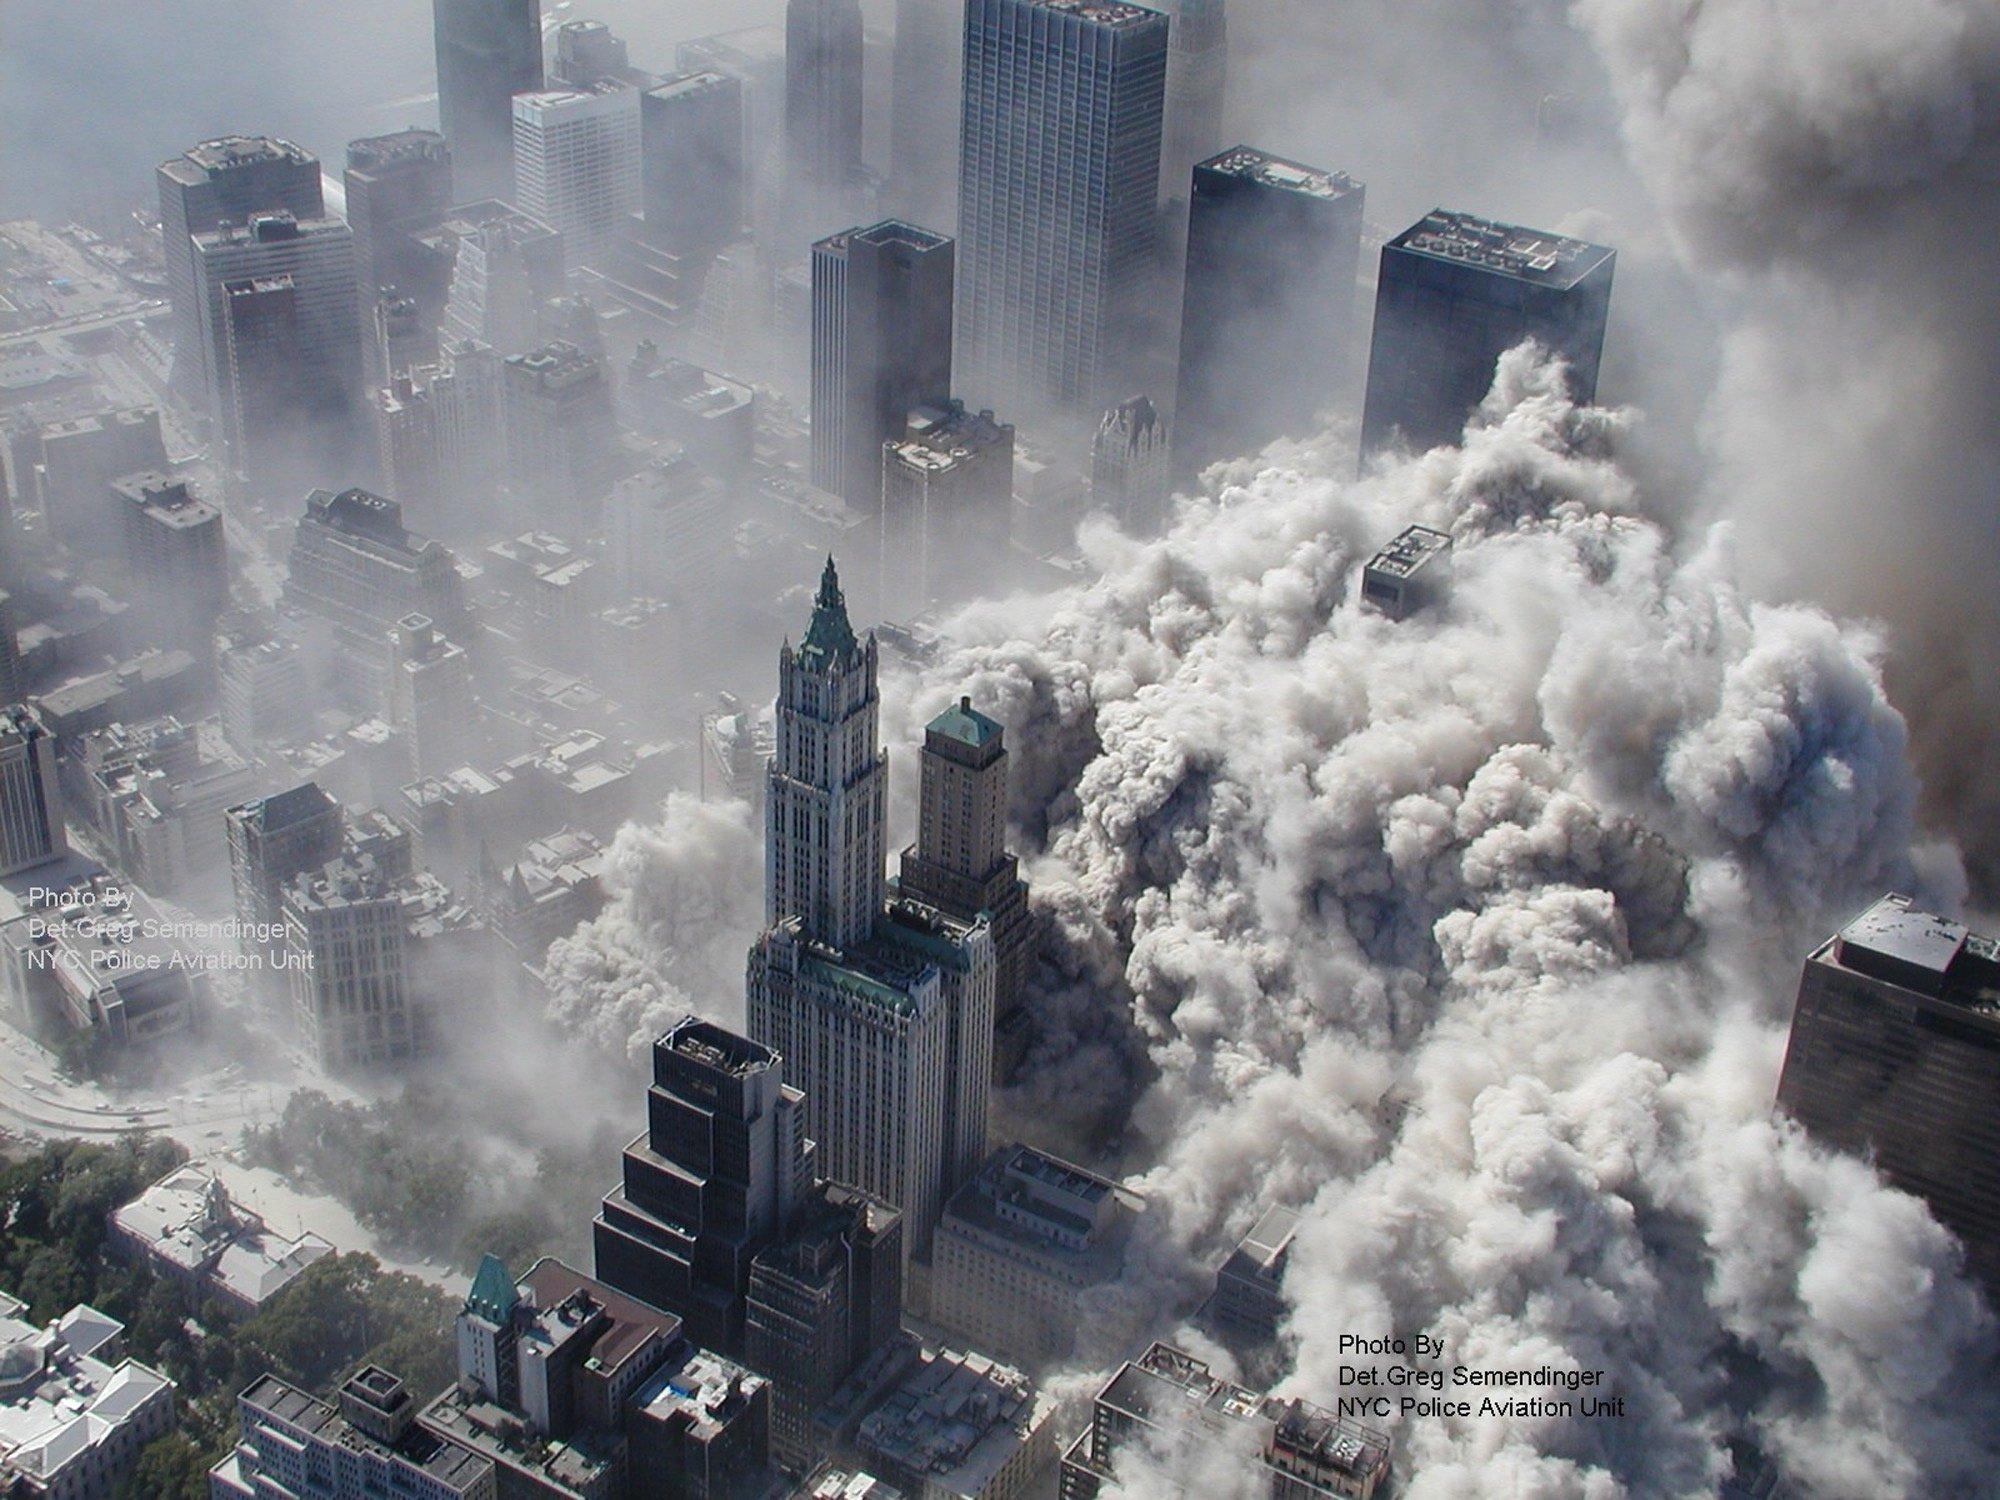 Zerstörung des World Trade Centers am 11. September 2001 in New York.